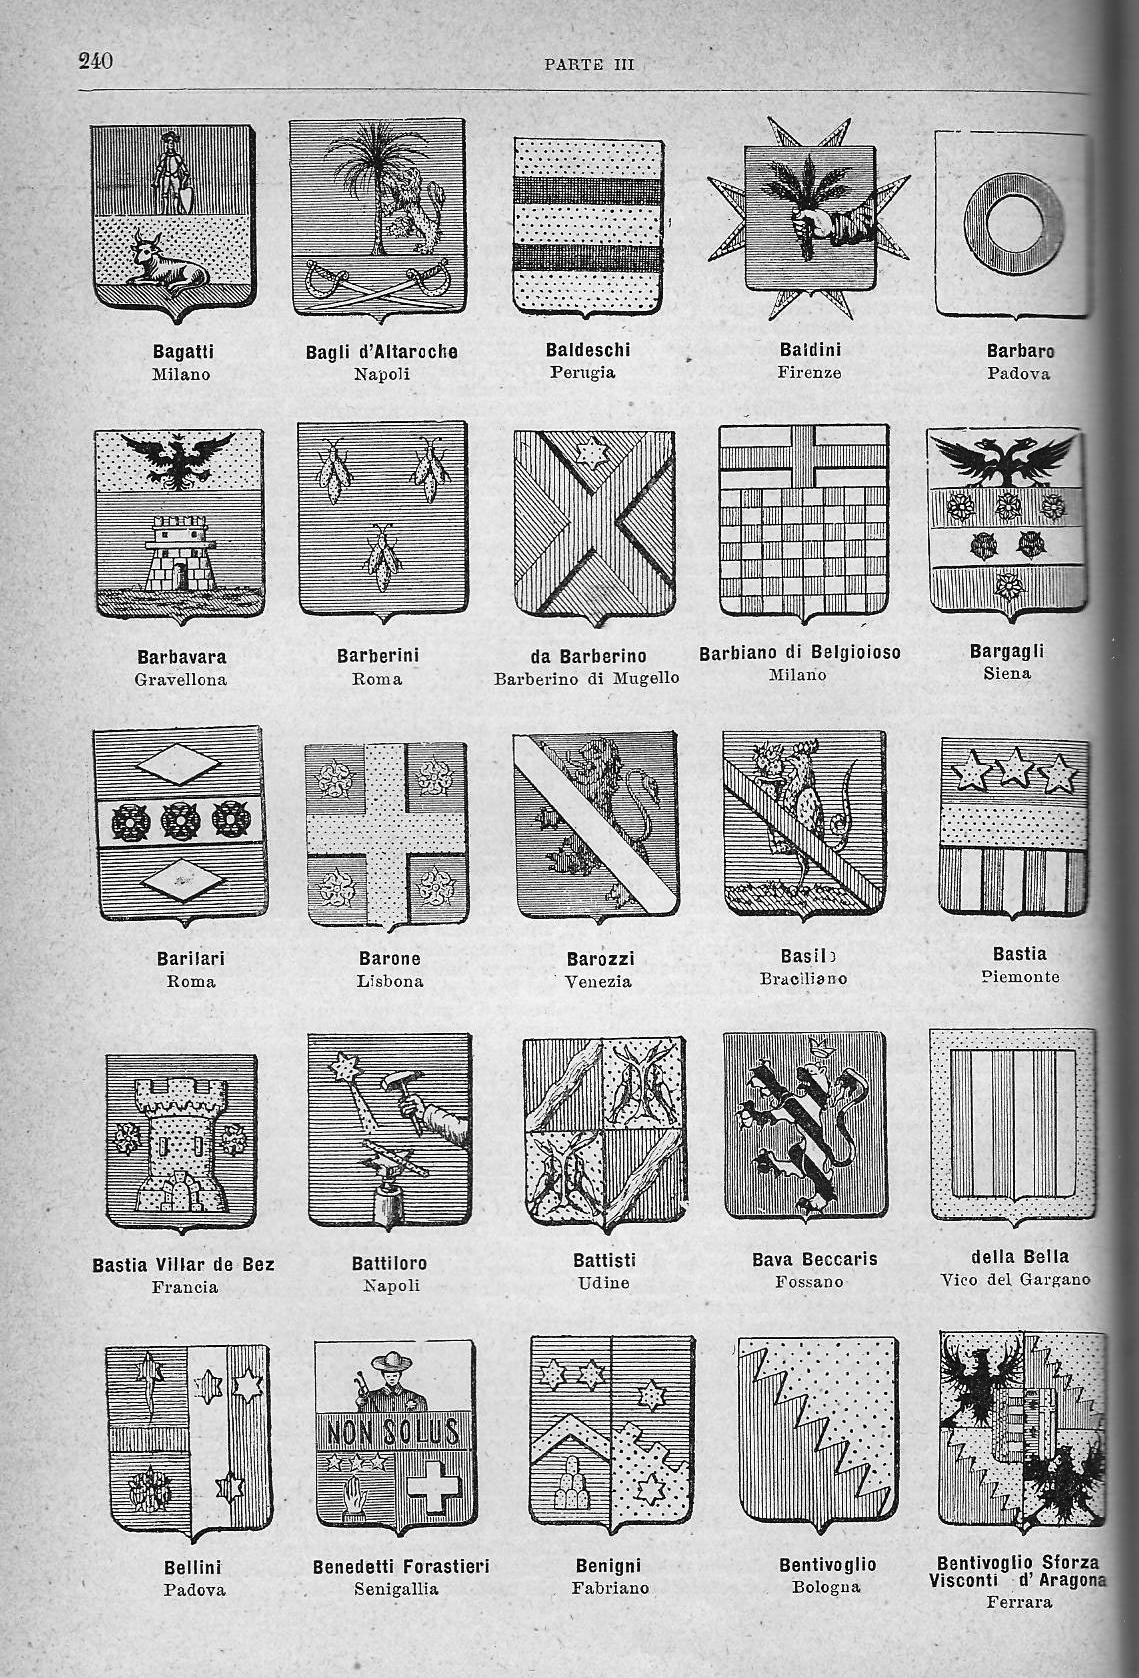 Calendario 1900.File Calendario D Oro 1900 Pagina 240 Jpg Wikimedia Commons